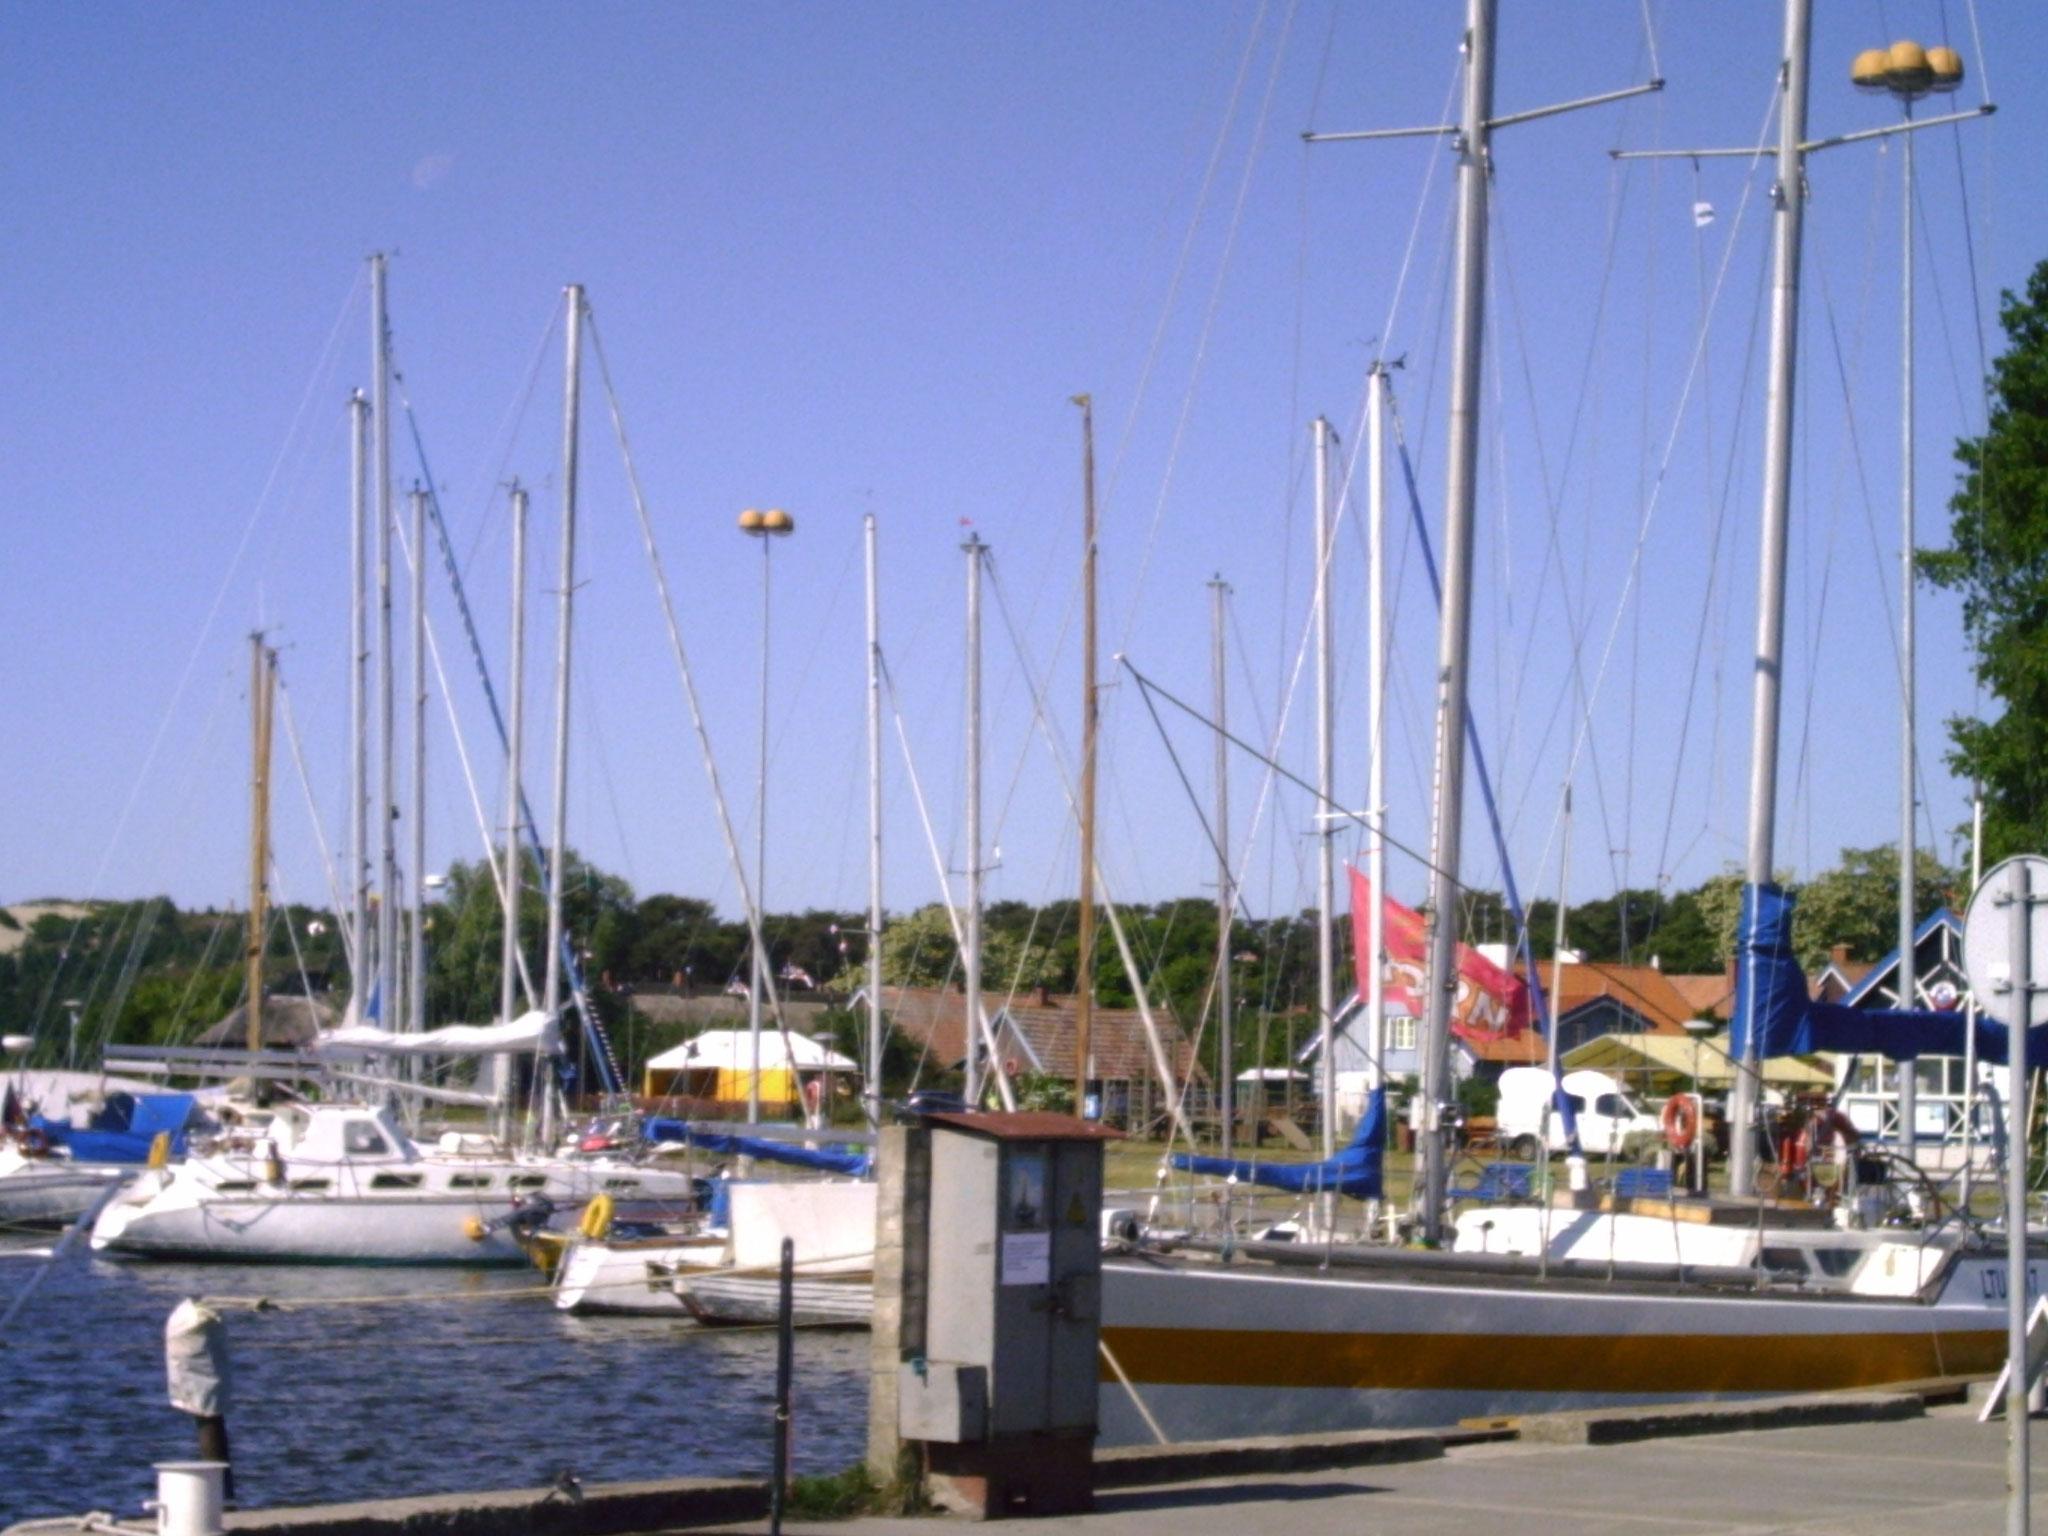 Marina in Nidden